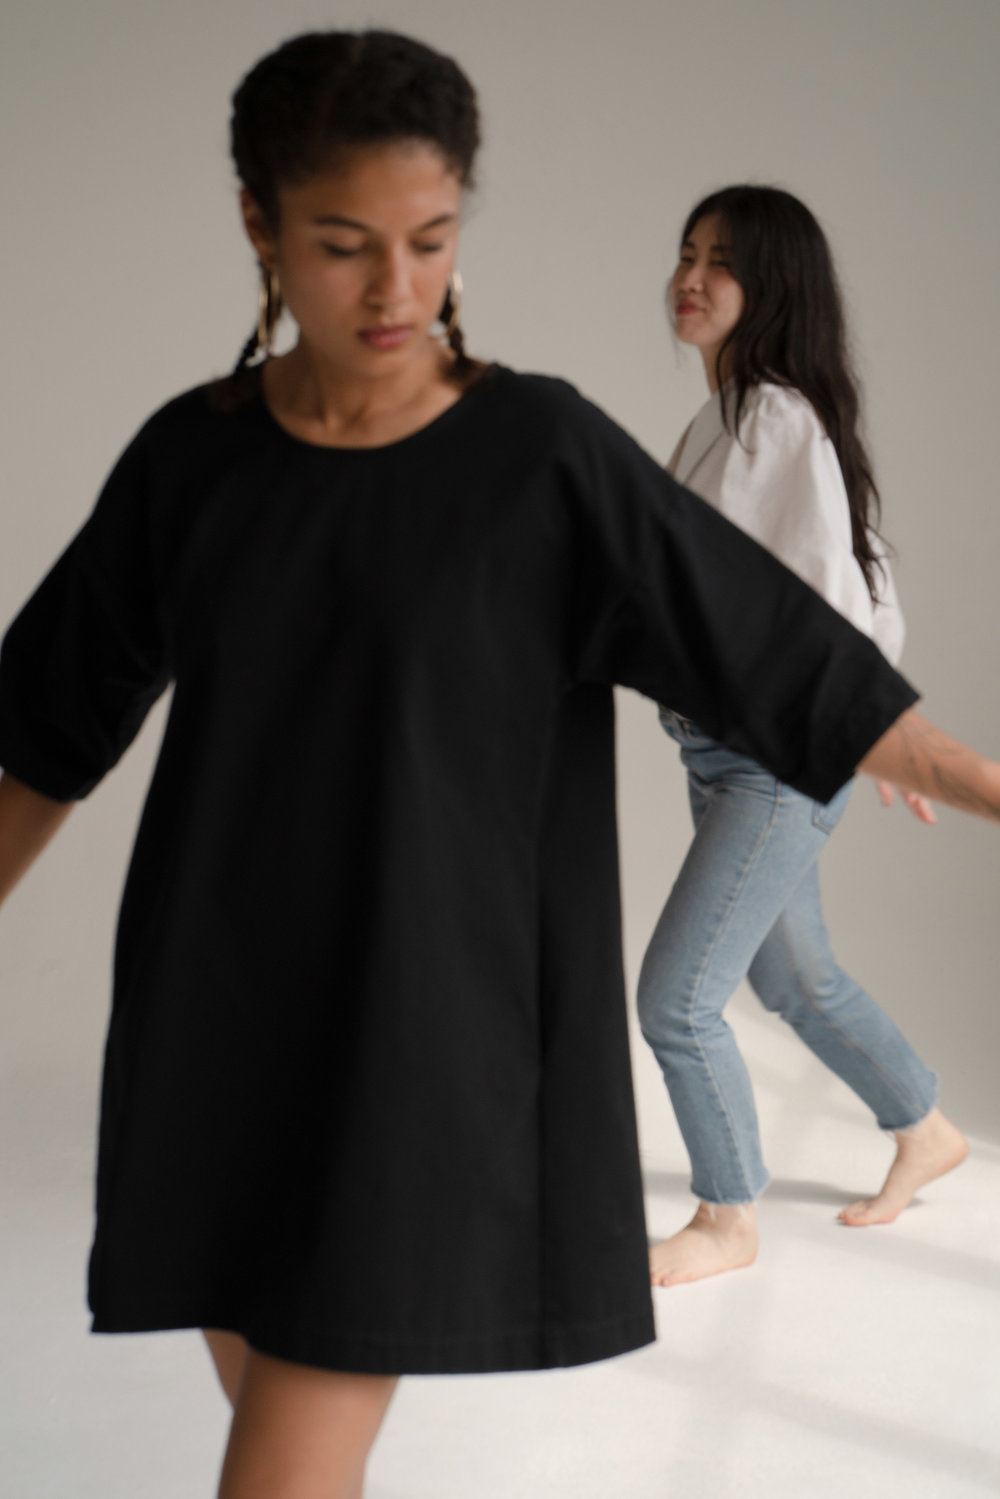 TENT DRESS  BLACK. 20180520-DSC01871.jpg  sc 1 st  donu0027t worry baby & TENT DRESS : BLACK u2014 DONu0027T WORRY BABY